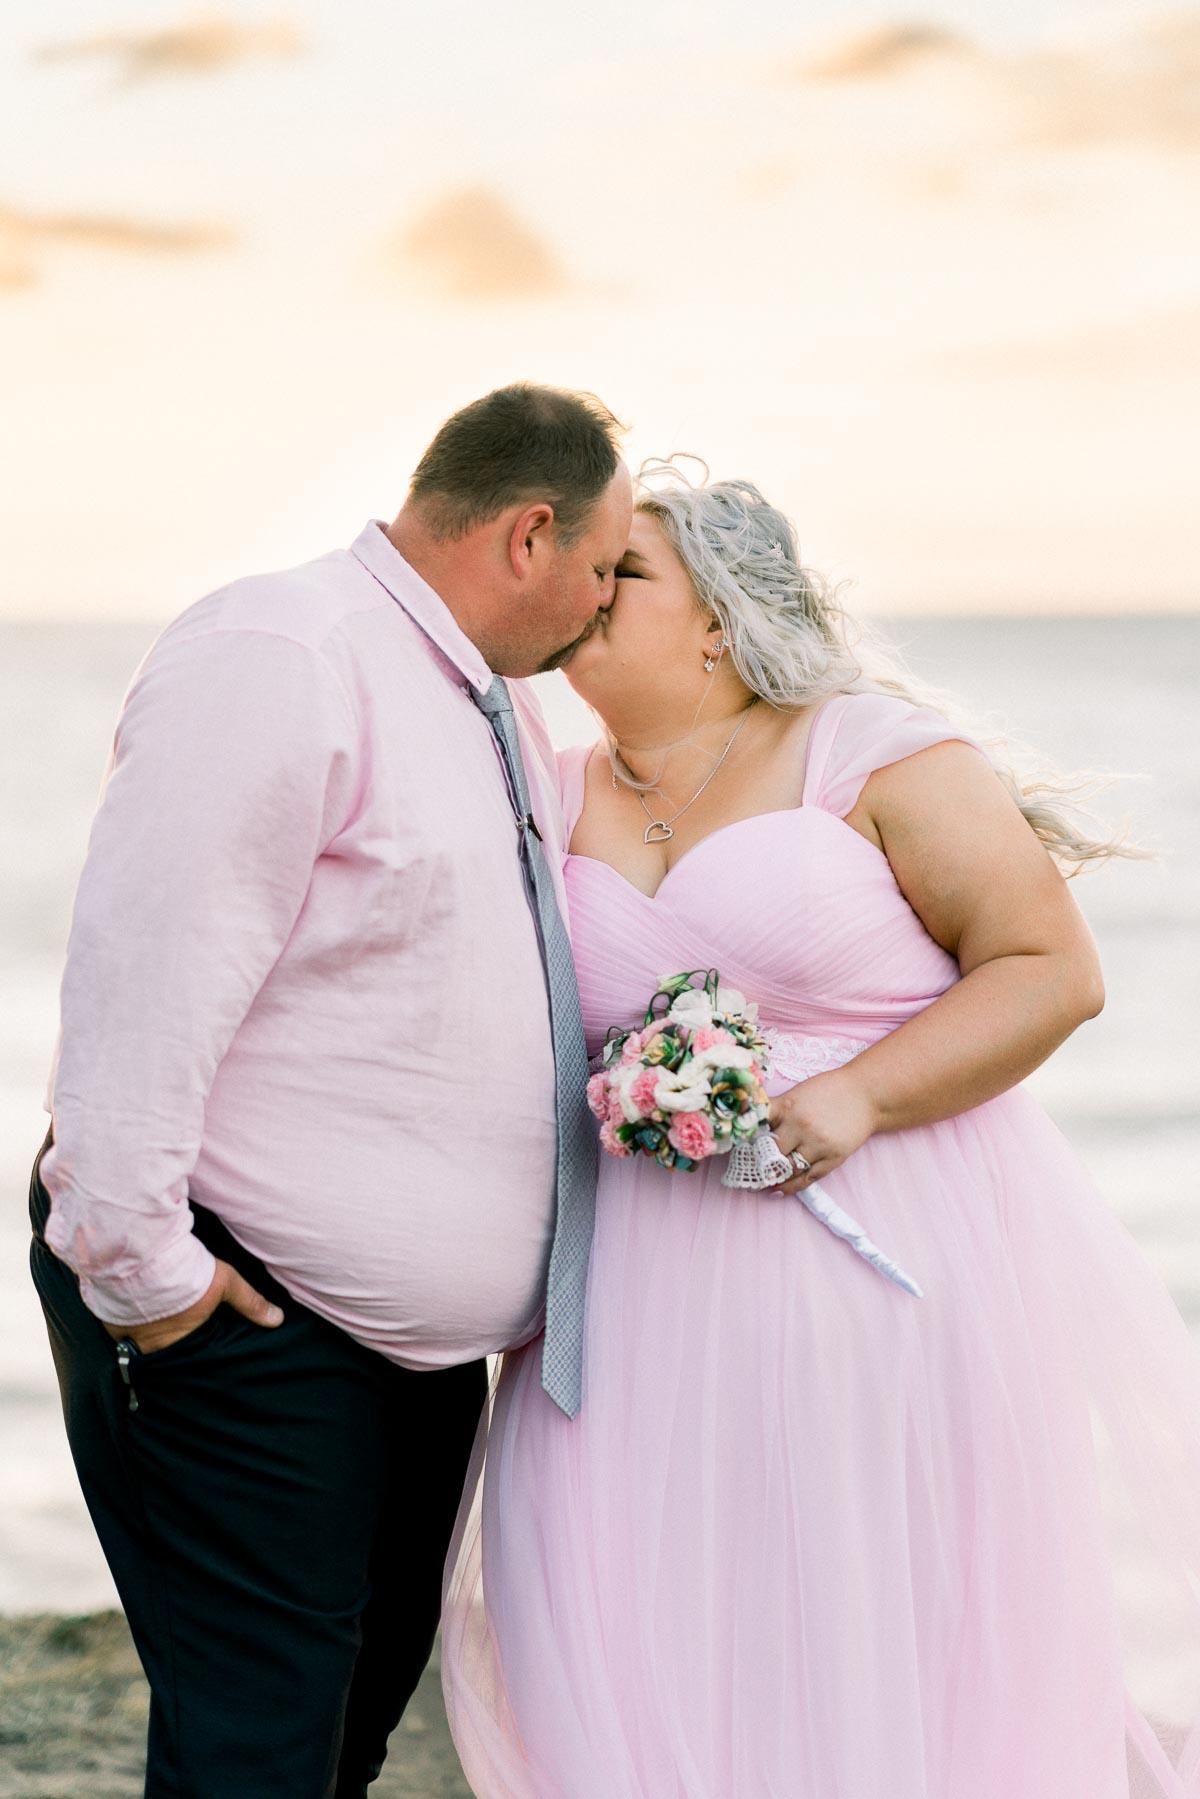 mt-eliza-mornington-peninsula-backyard-wedding-heart+soul-weddings-allison-matt-04080.jpg